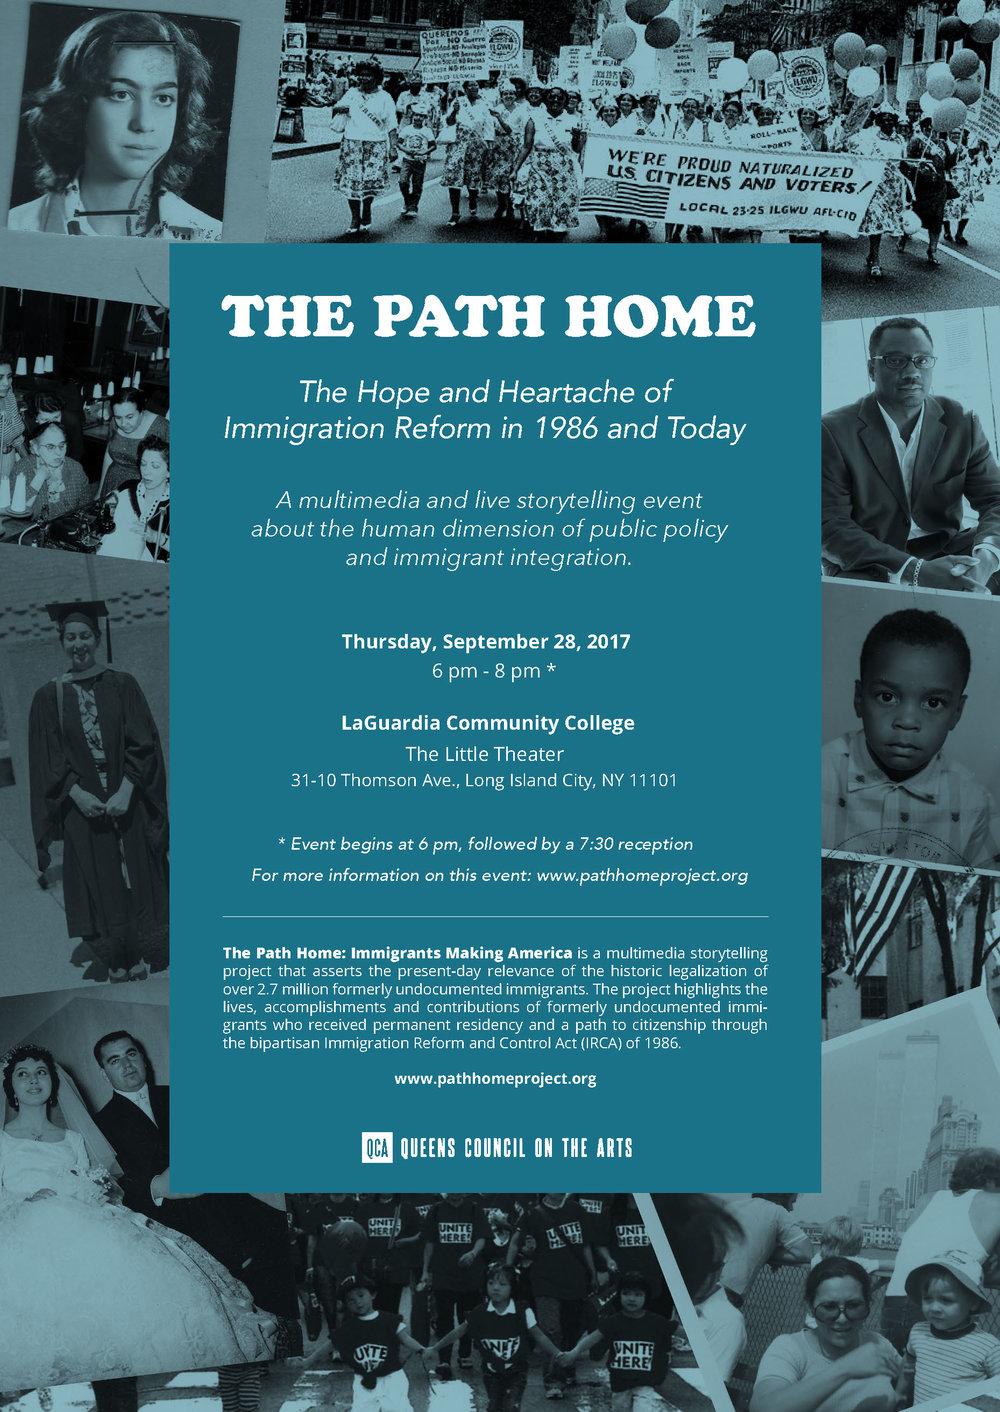 The_Path_Home-invite-print-final-web.jpg